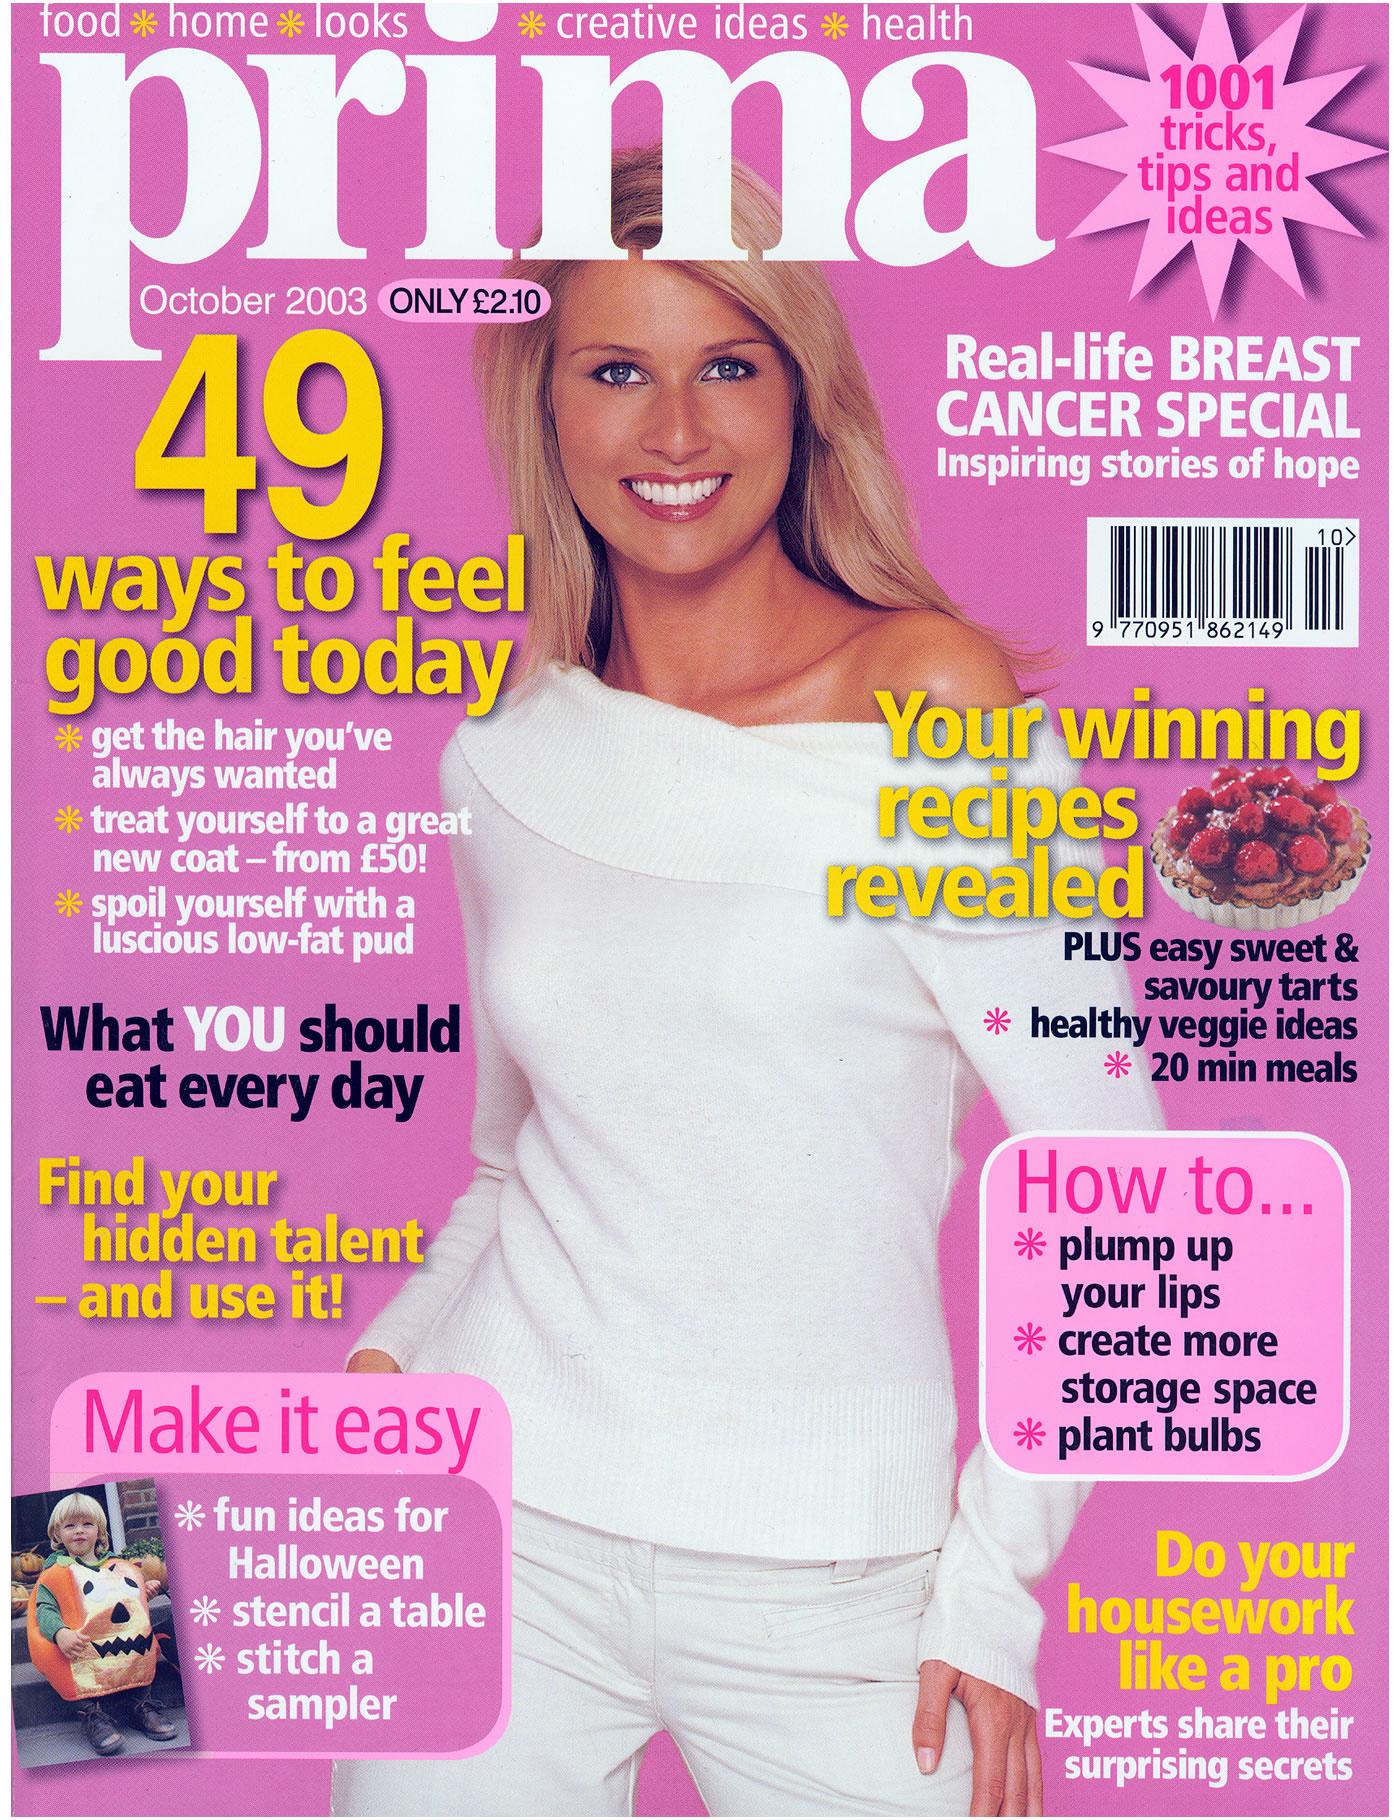 Prima Magazine - October 2003 front cover